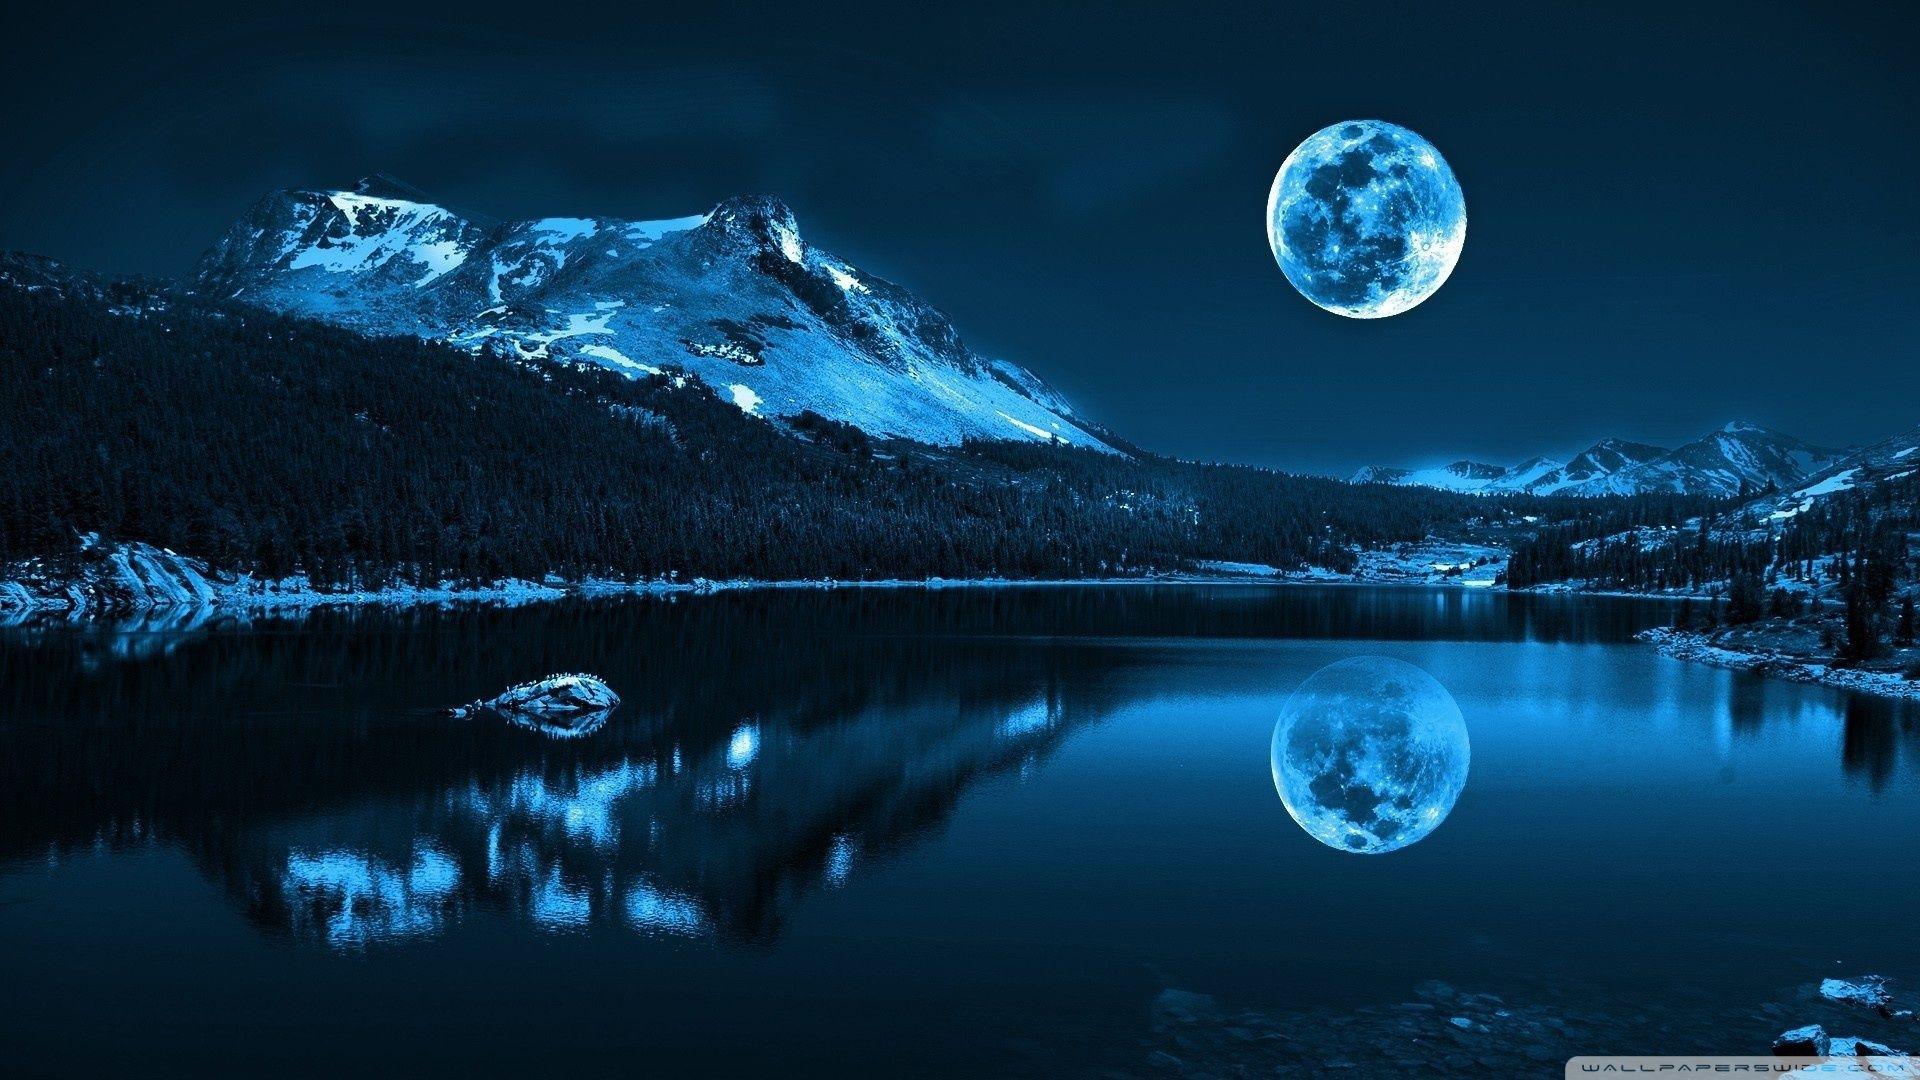 Moonlight Night Ultra Hd Wallpaper For 4k Uhd Widescreen Desktop Tablet Smartphone Aero In 2020 Beautiful Nature Beautiful Moon Beautiful Landscapes